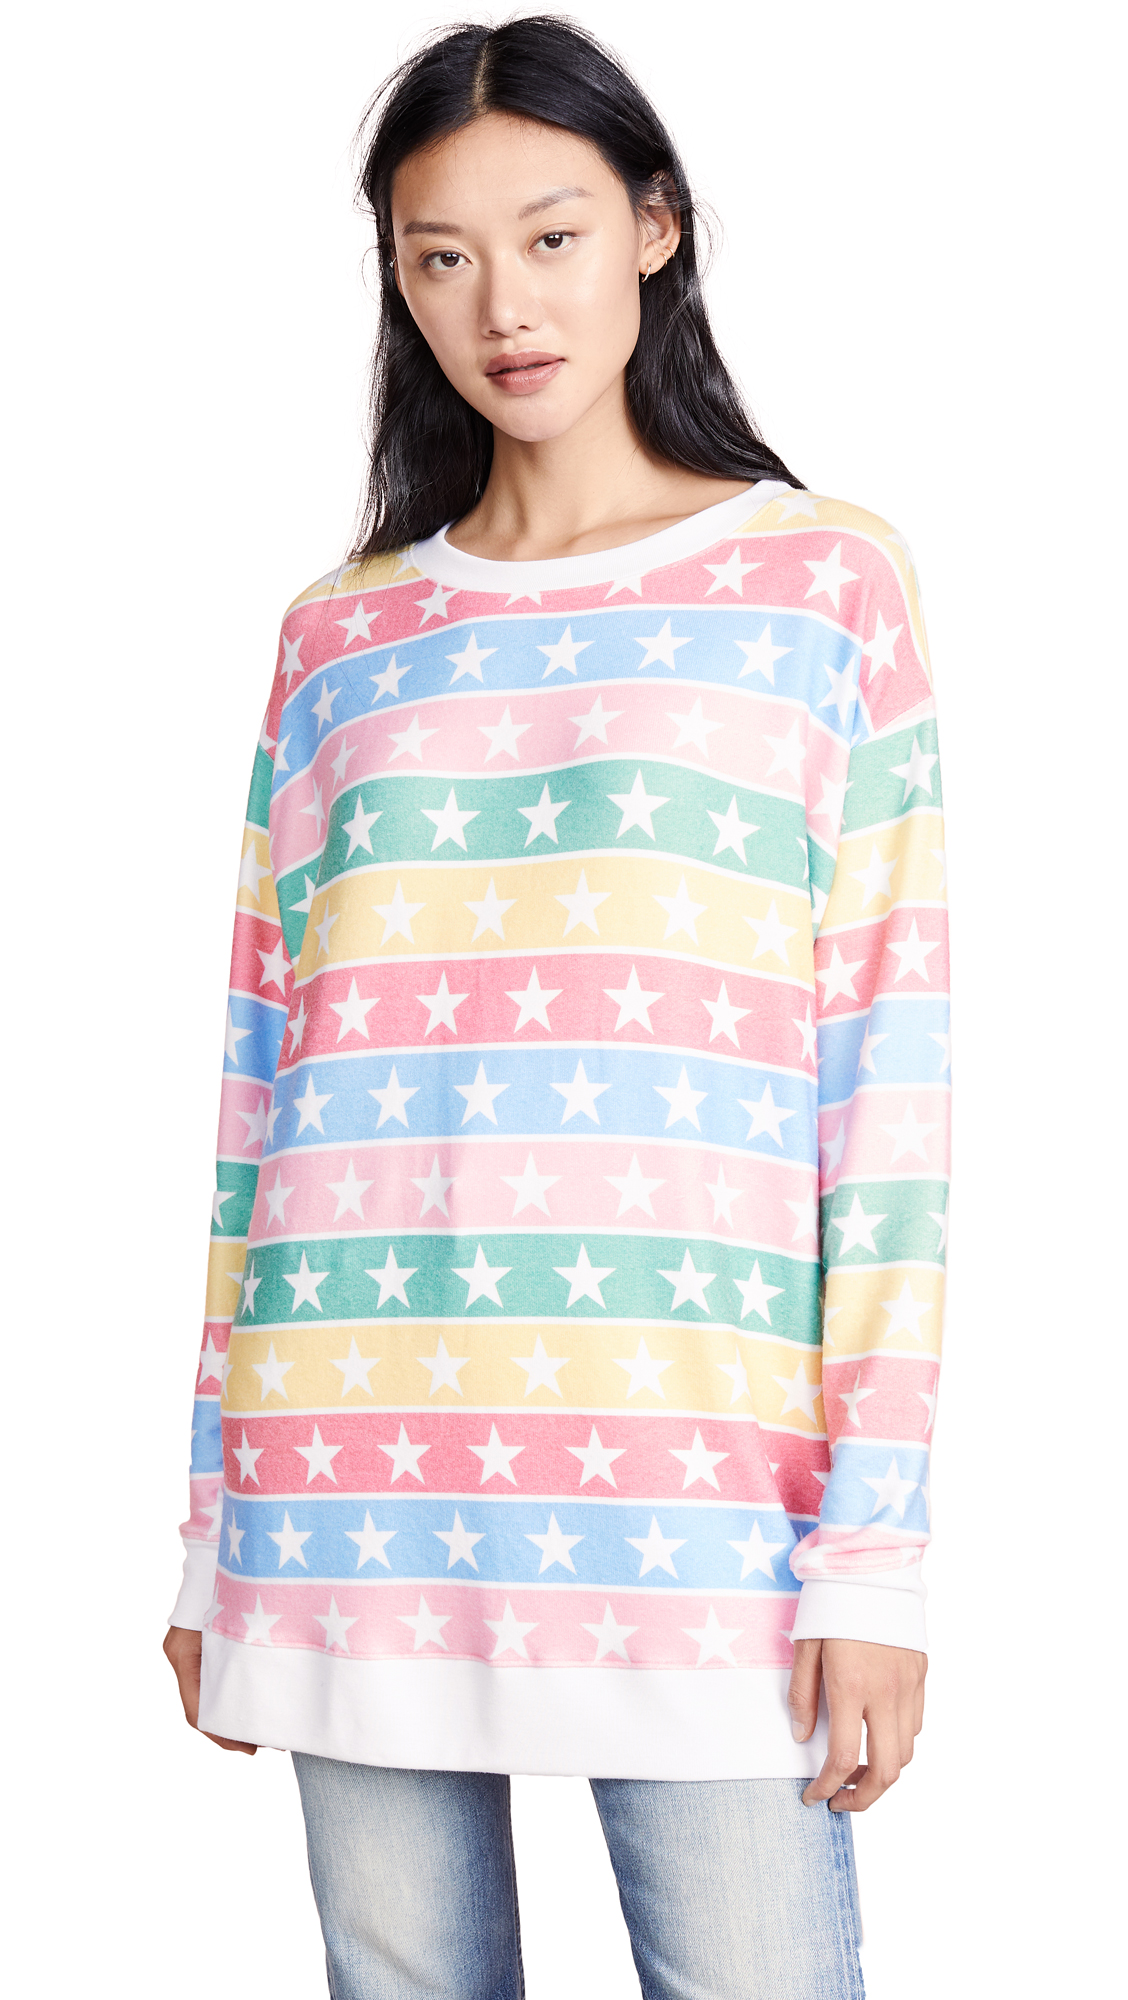 Wildfox Stellar Stripe Roadtrip Sweatshirt In Multi/Clean White